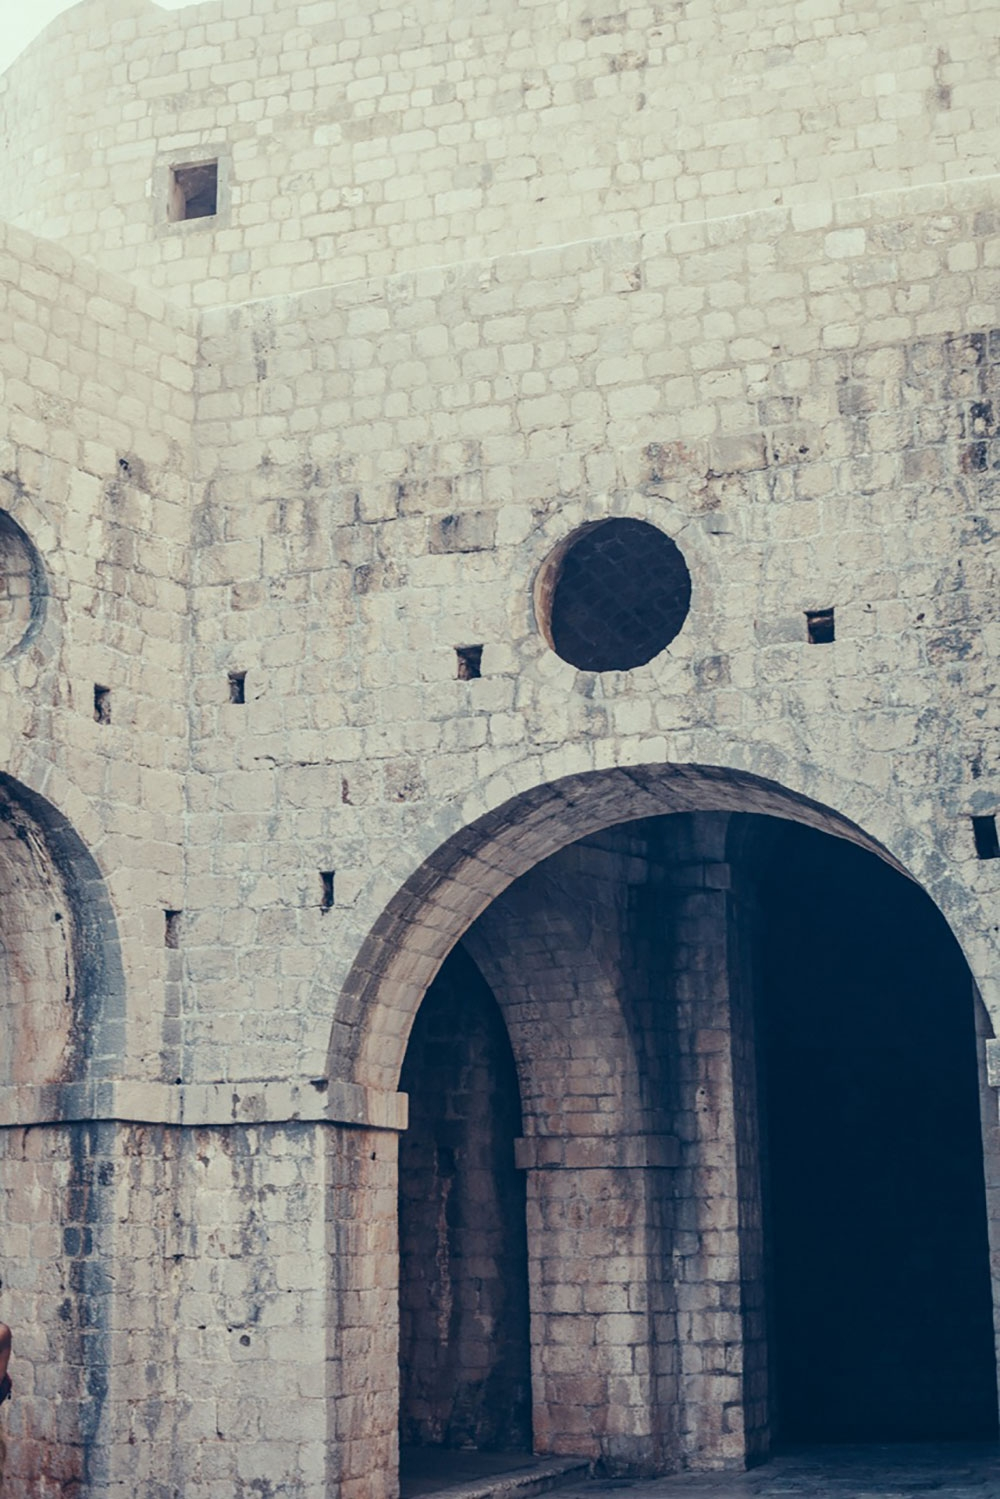 Large archways inside the brick walls of Lovrijenac – Dubrovnik